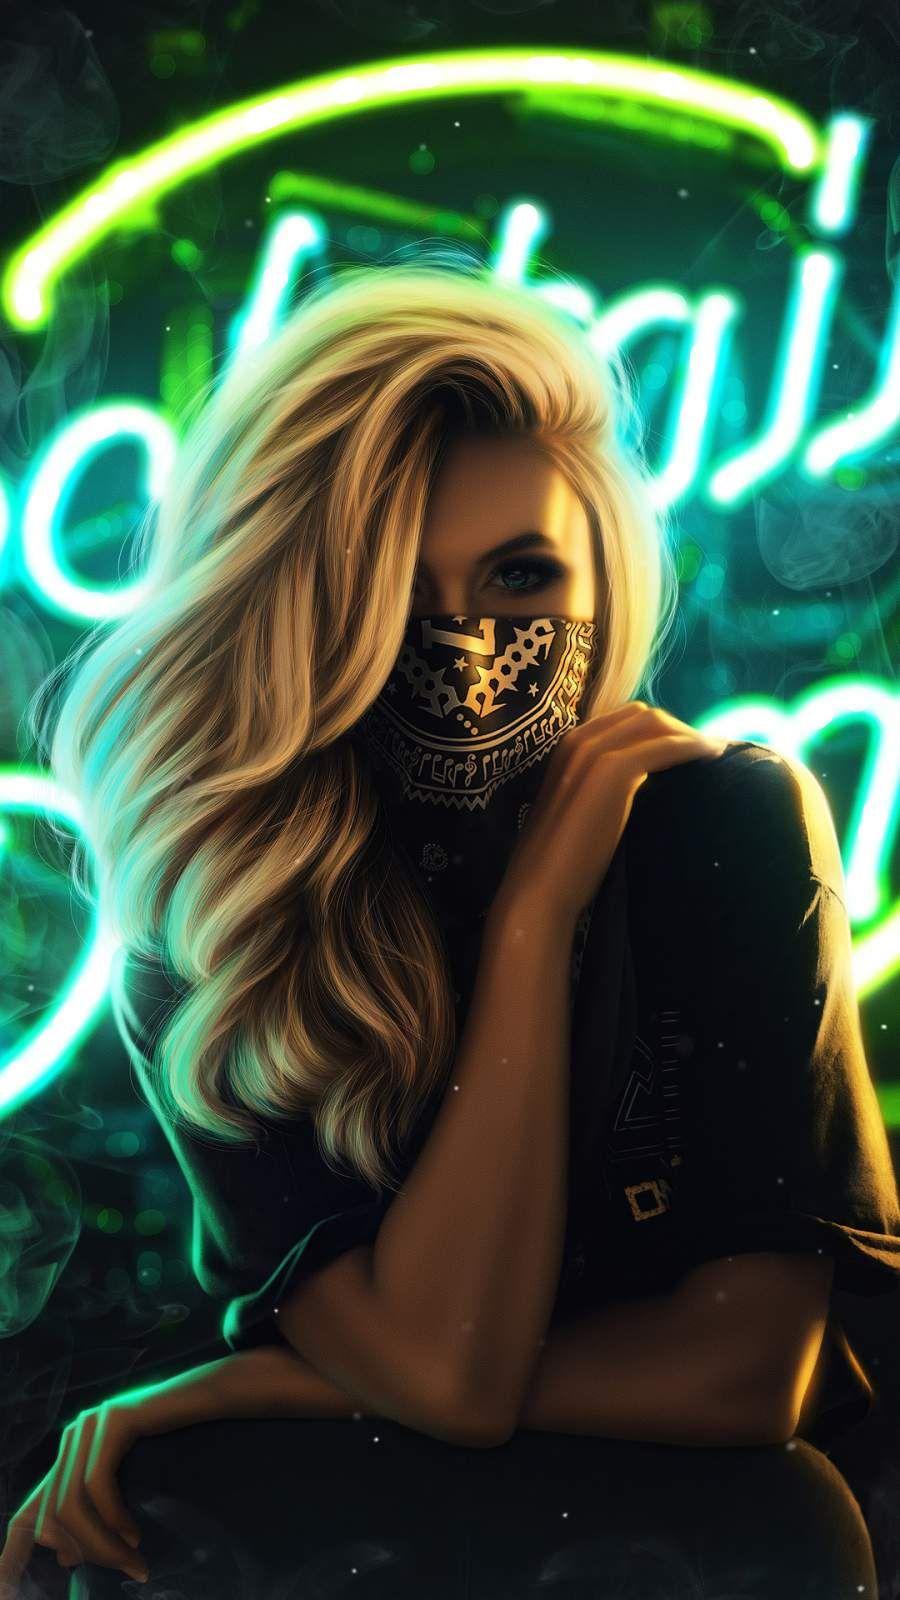 Blonde Girl Face Mask Beautiful Girl Drawing Mask Girl Cartoon Girl Images